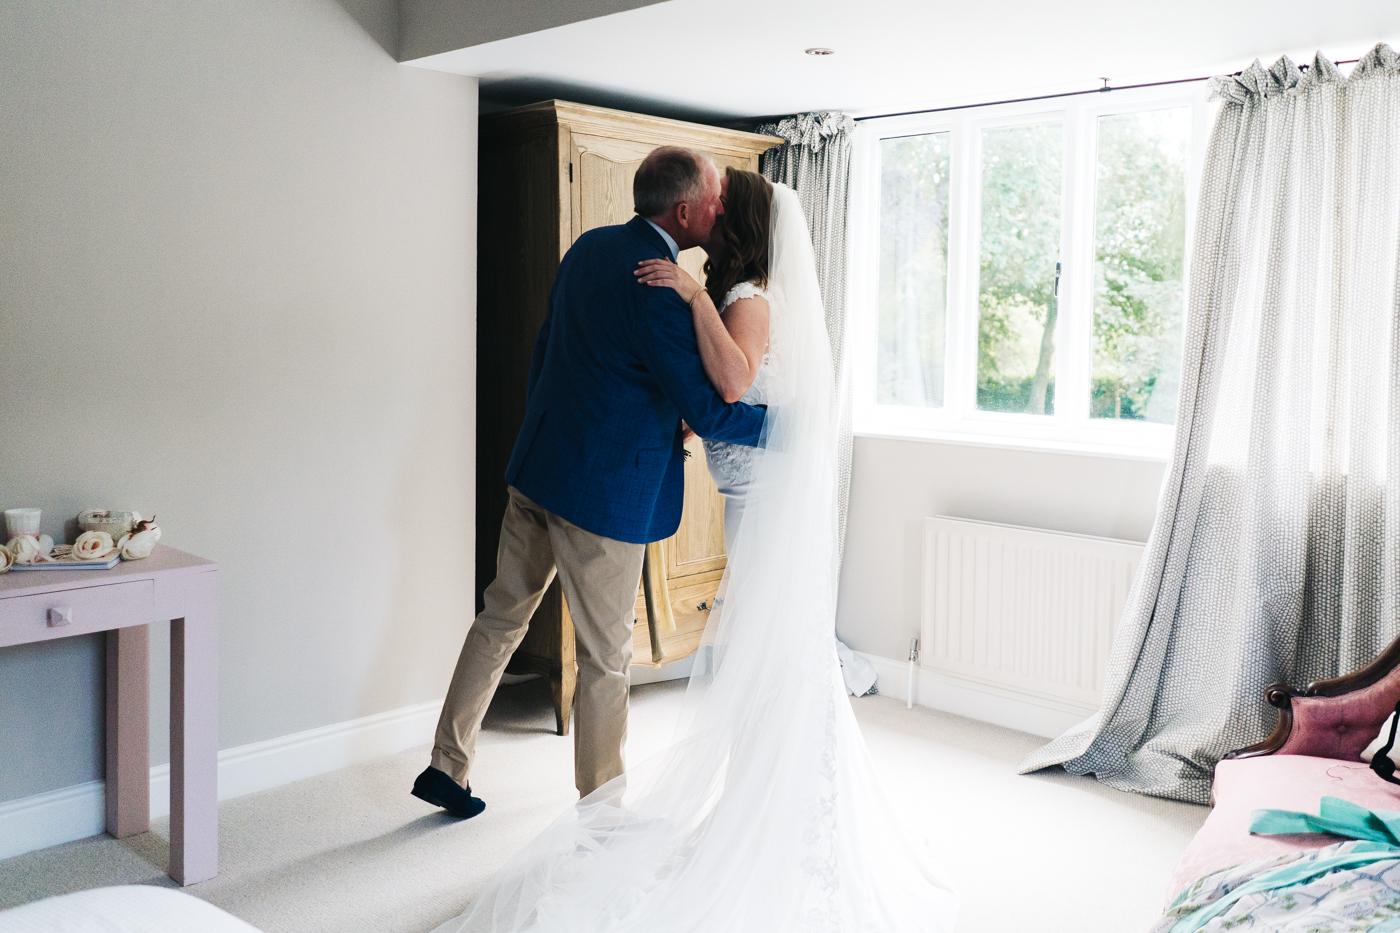 wedding-at-the-pheasant-harome-helmsley-north-yorkshire-wedding-photographer-0008.jpg